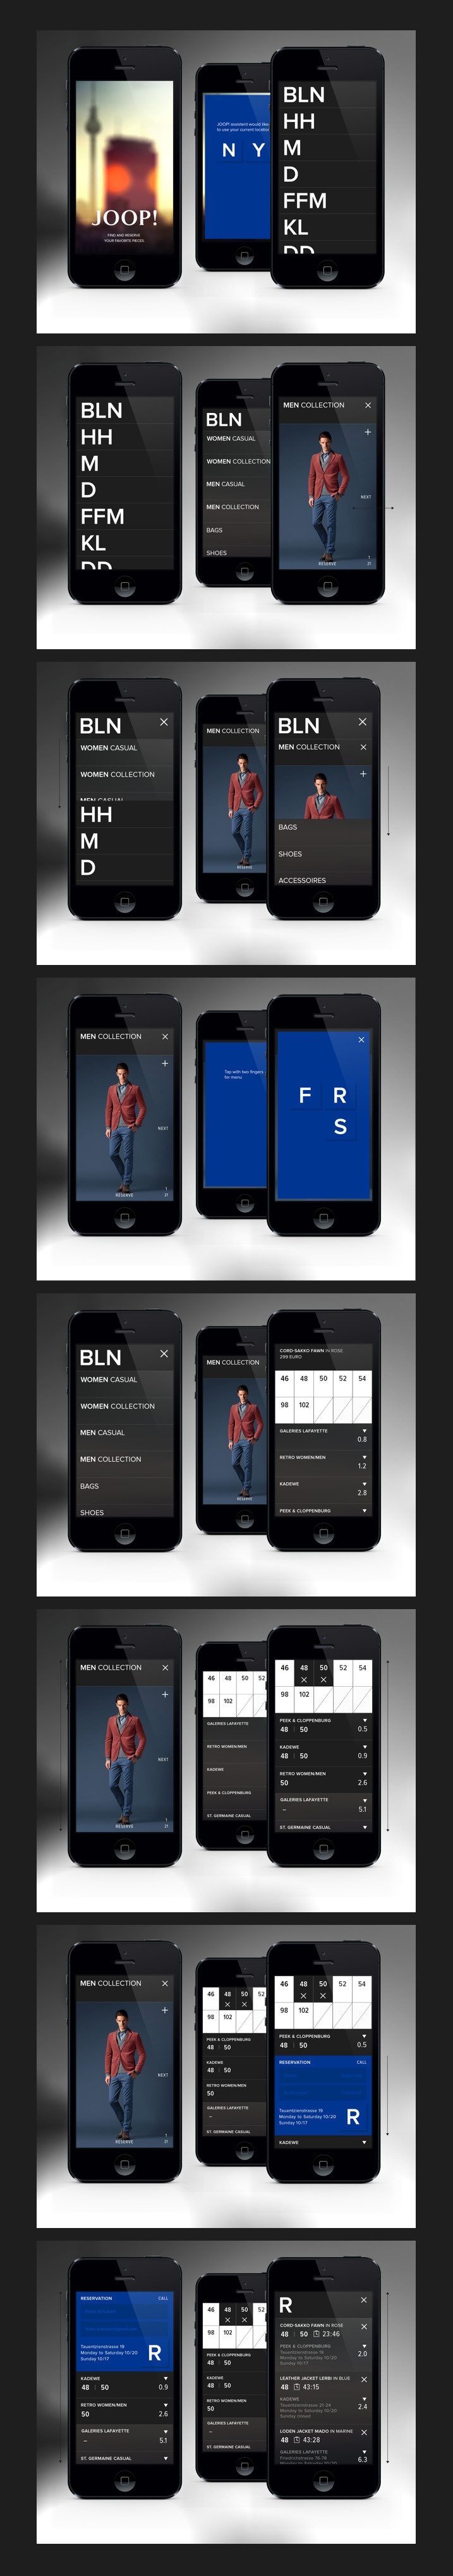 JOOP! Assistent - iPhone App / Conny Naumann #ui #design #user #iterface #ios